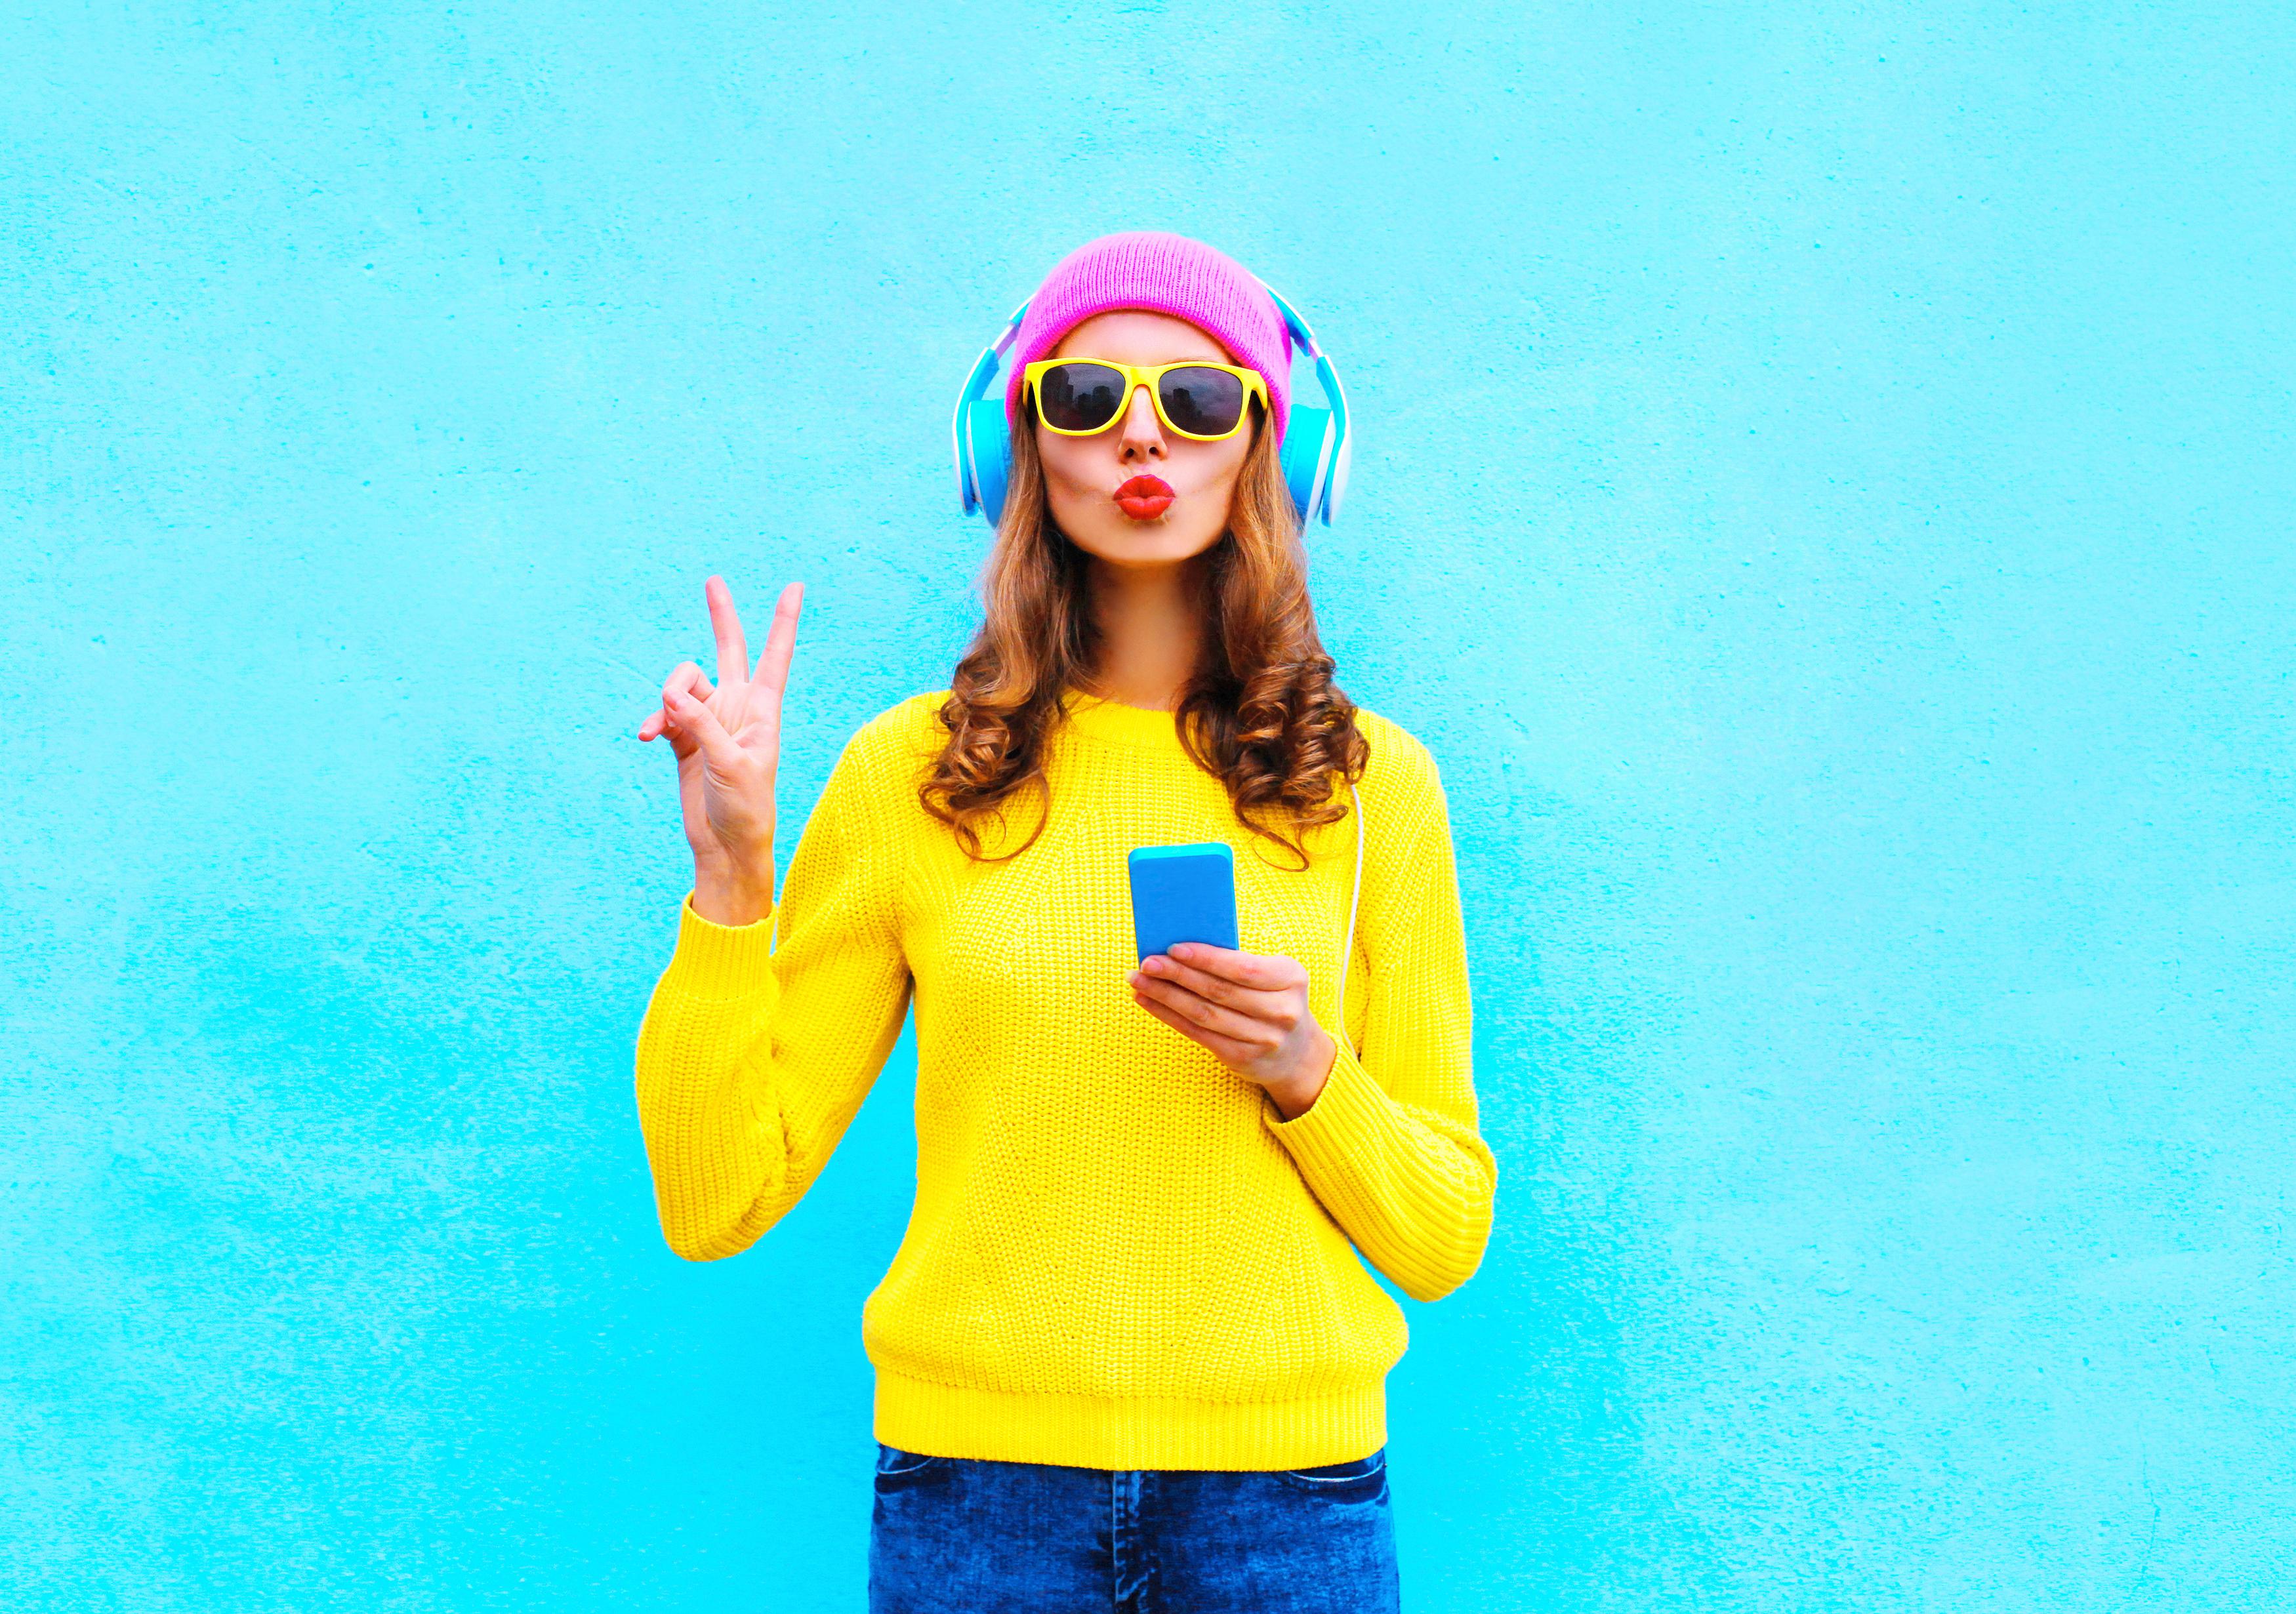 WiMAXの口座振替プロバイダはUQ WiMAXがおすすめ!